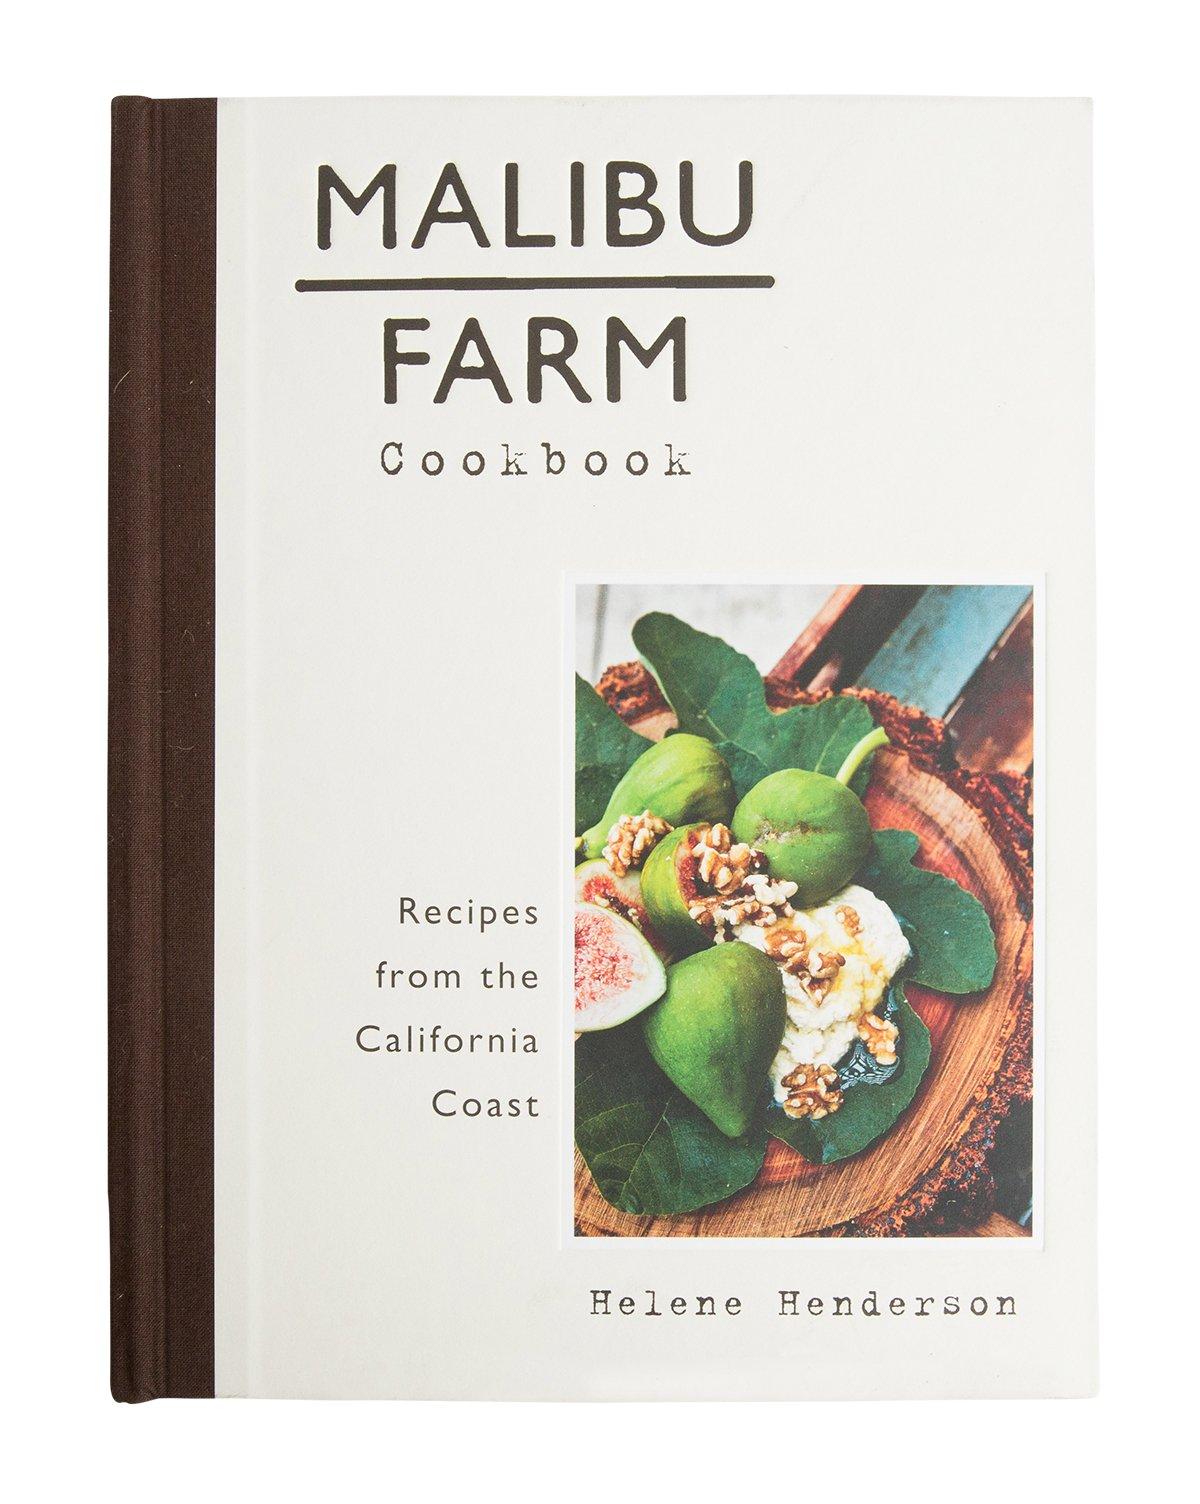 Malibu_Farm_1.jpg